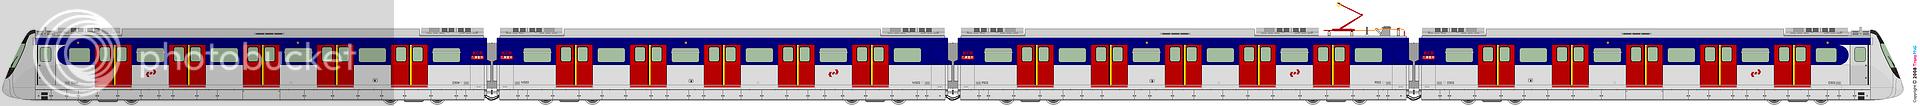 Train 1951